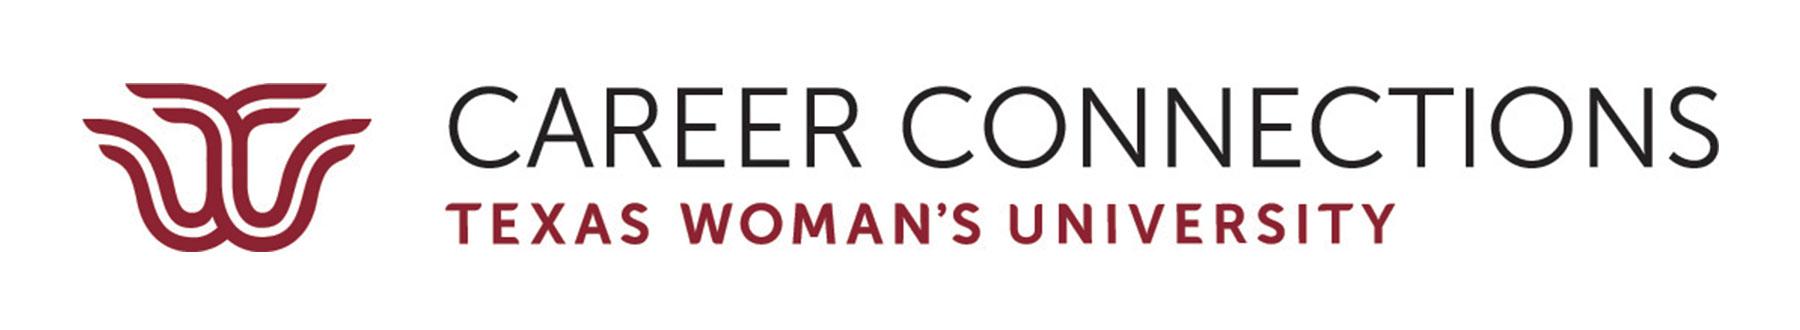 Texas Woman's University Banner